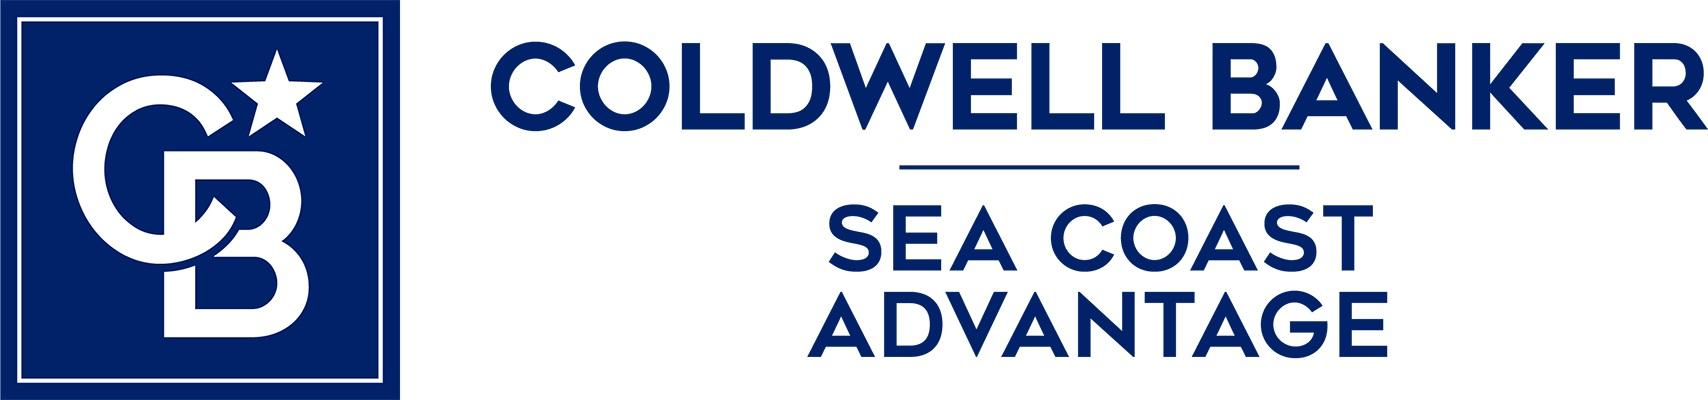 Karen Bailey - Coldwell Banker Sea Coast Advantage Realty Logo